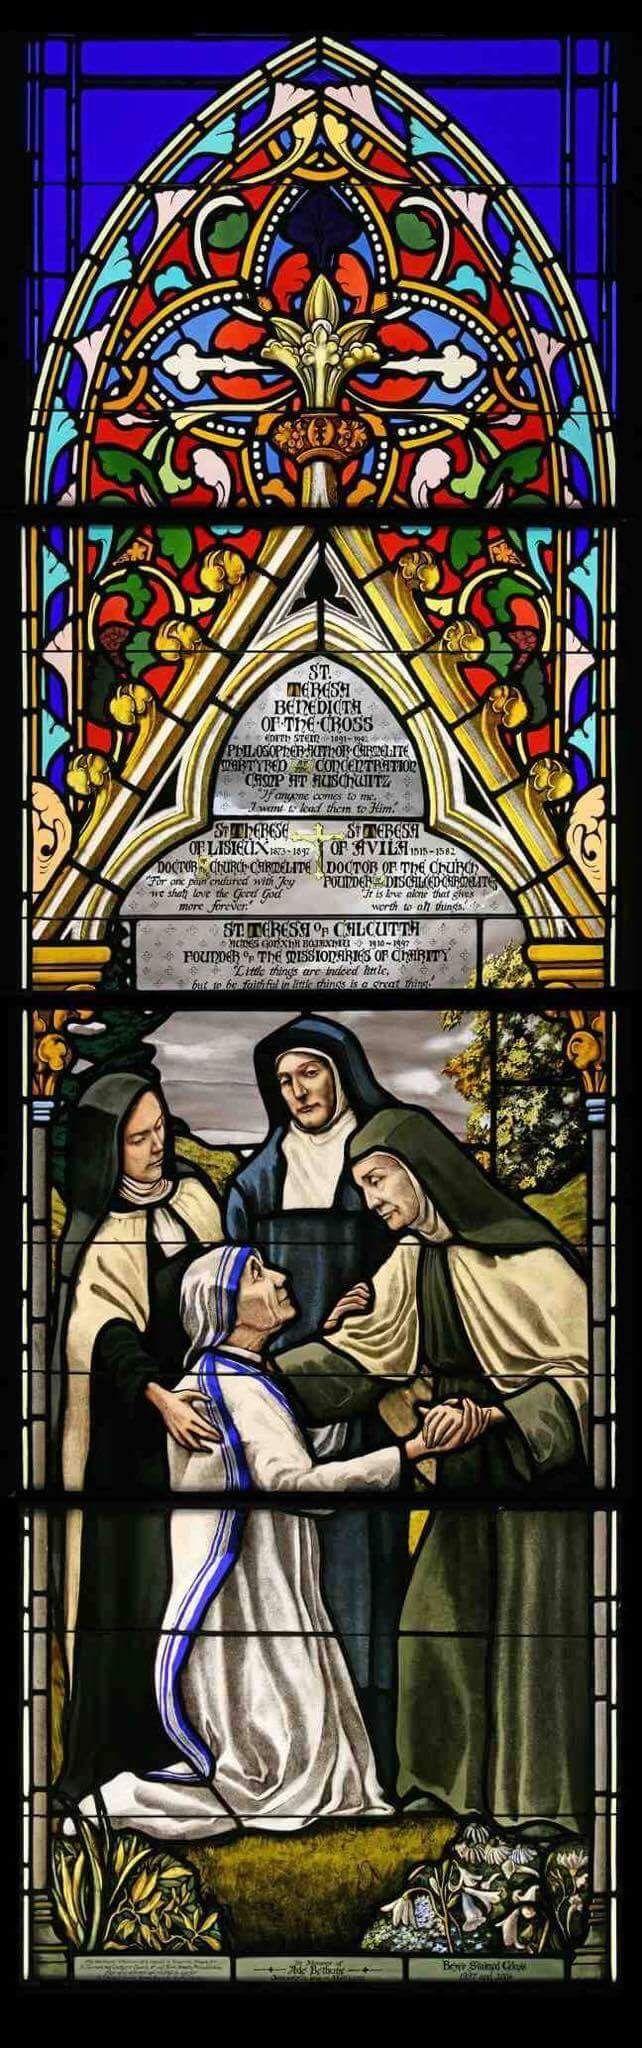 Welcoming a new Saint : St Teresa of Calcutta